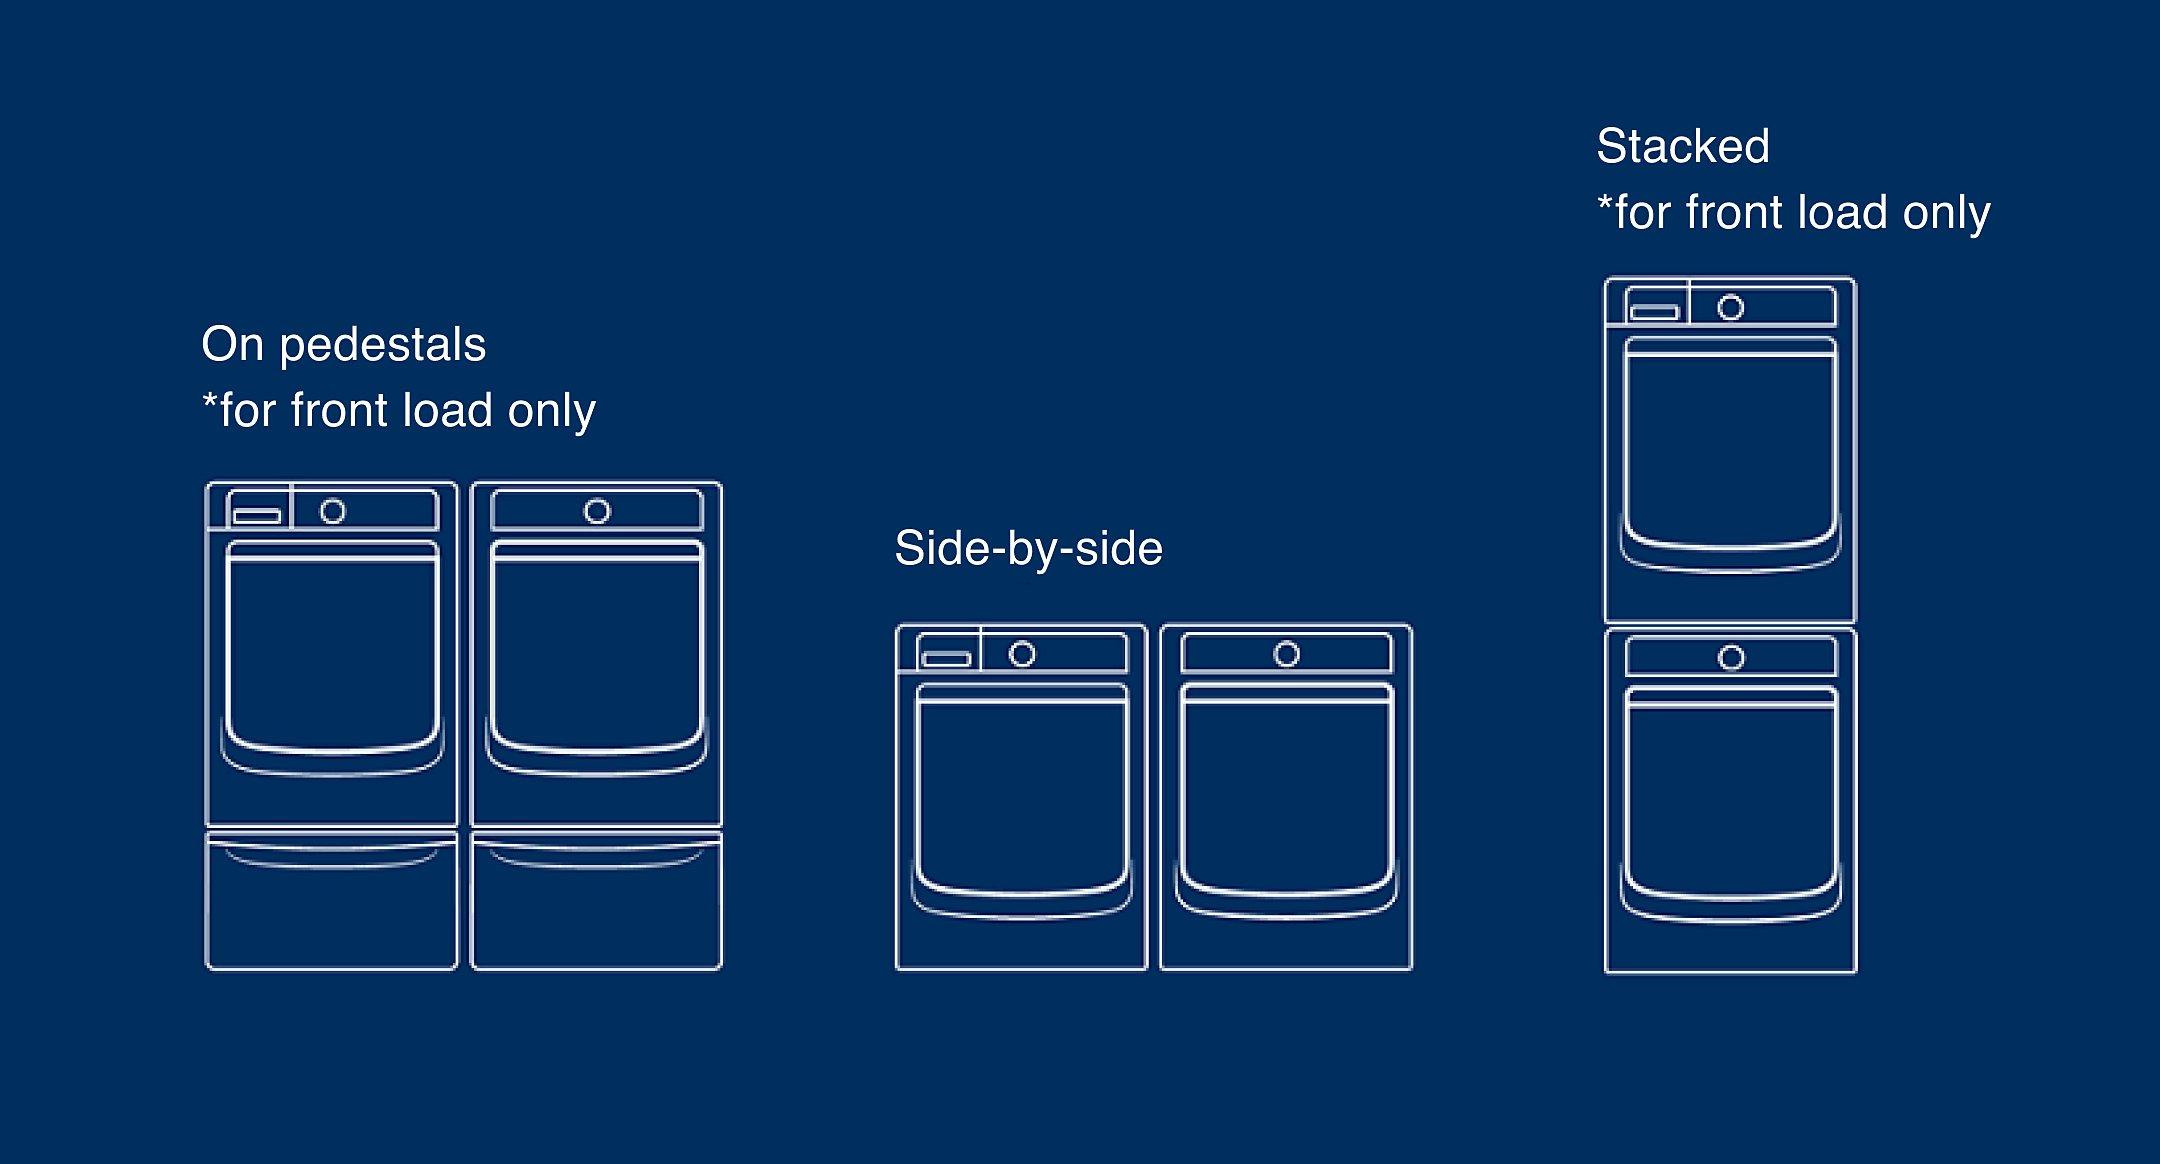 Laundry pair setup options